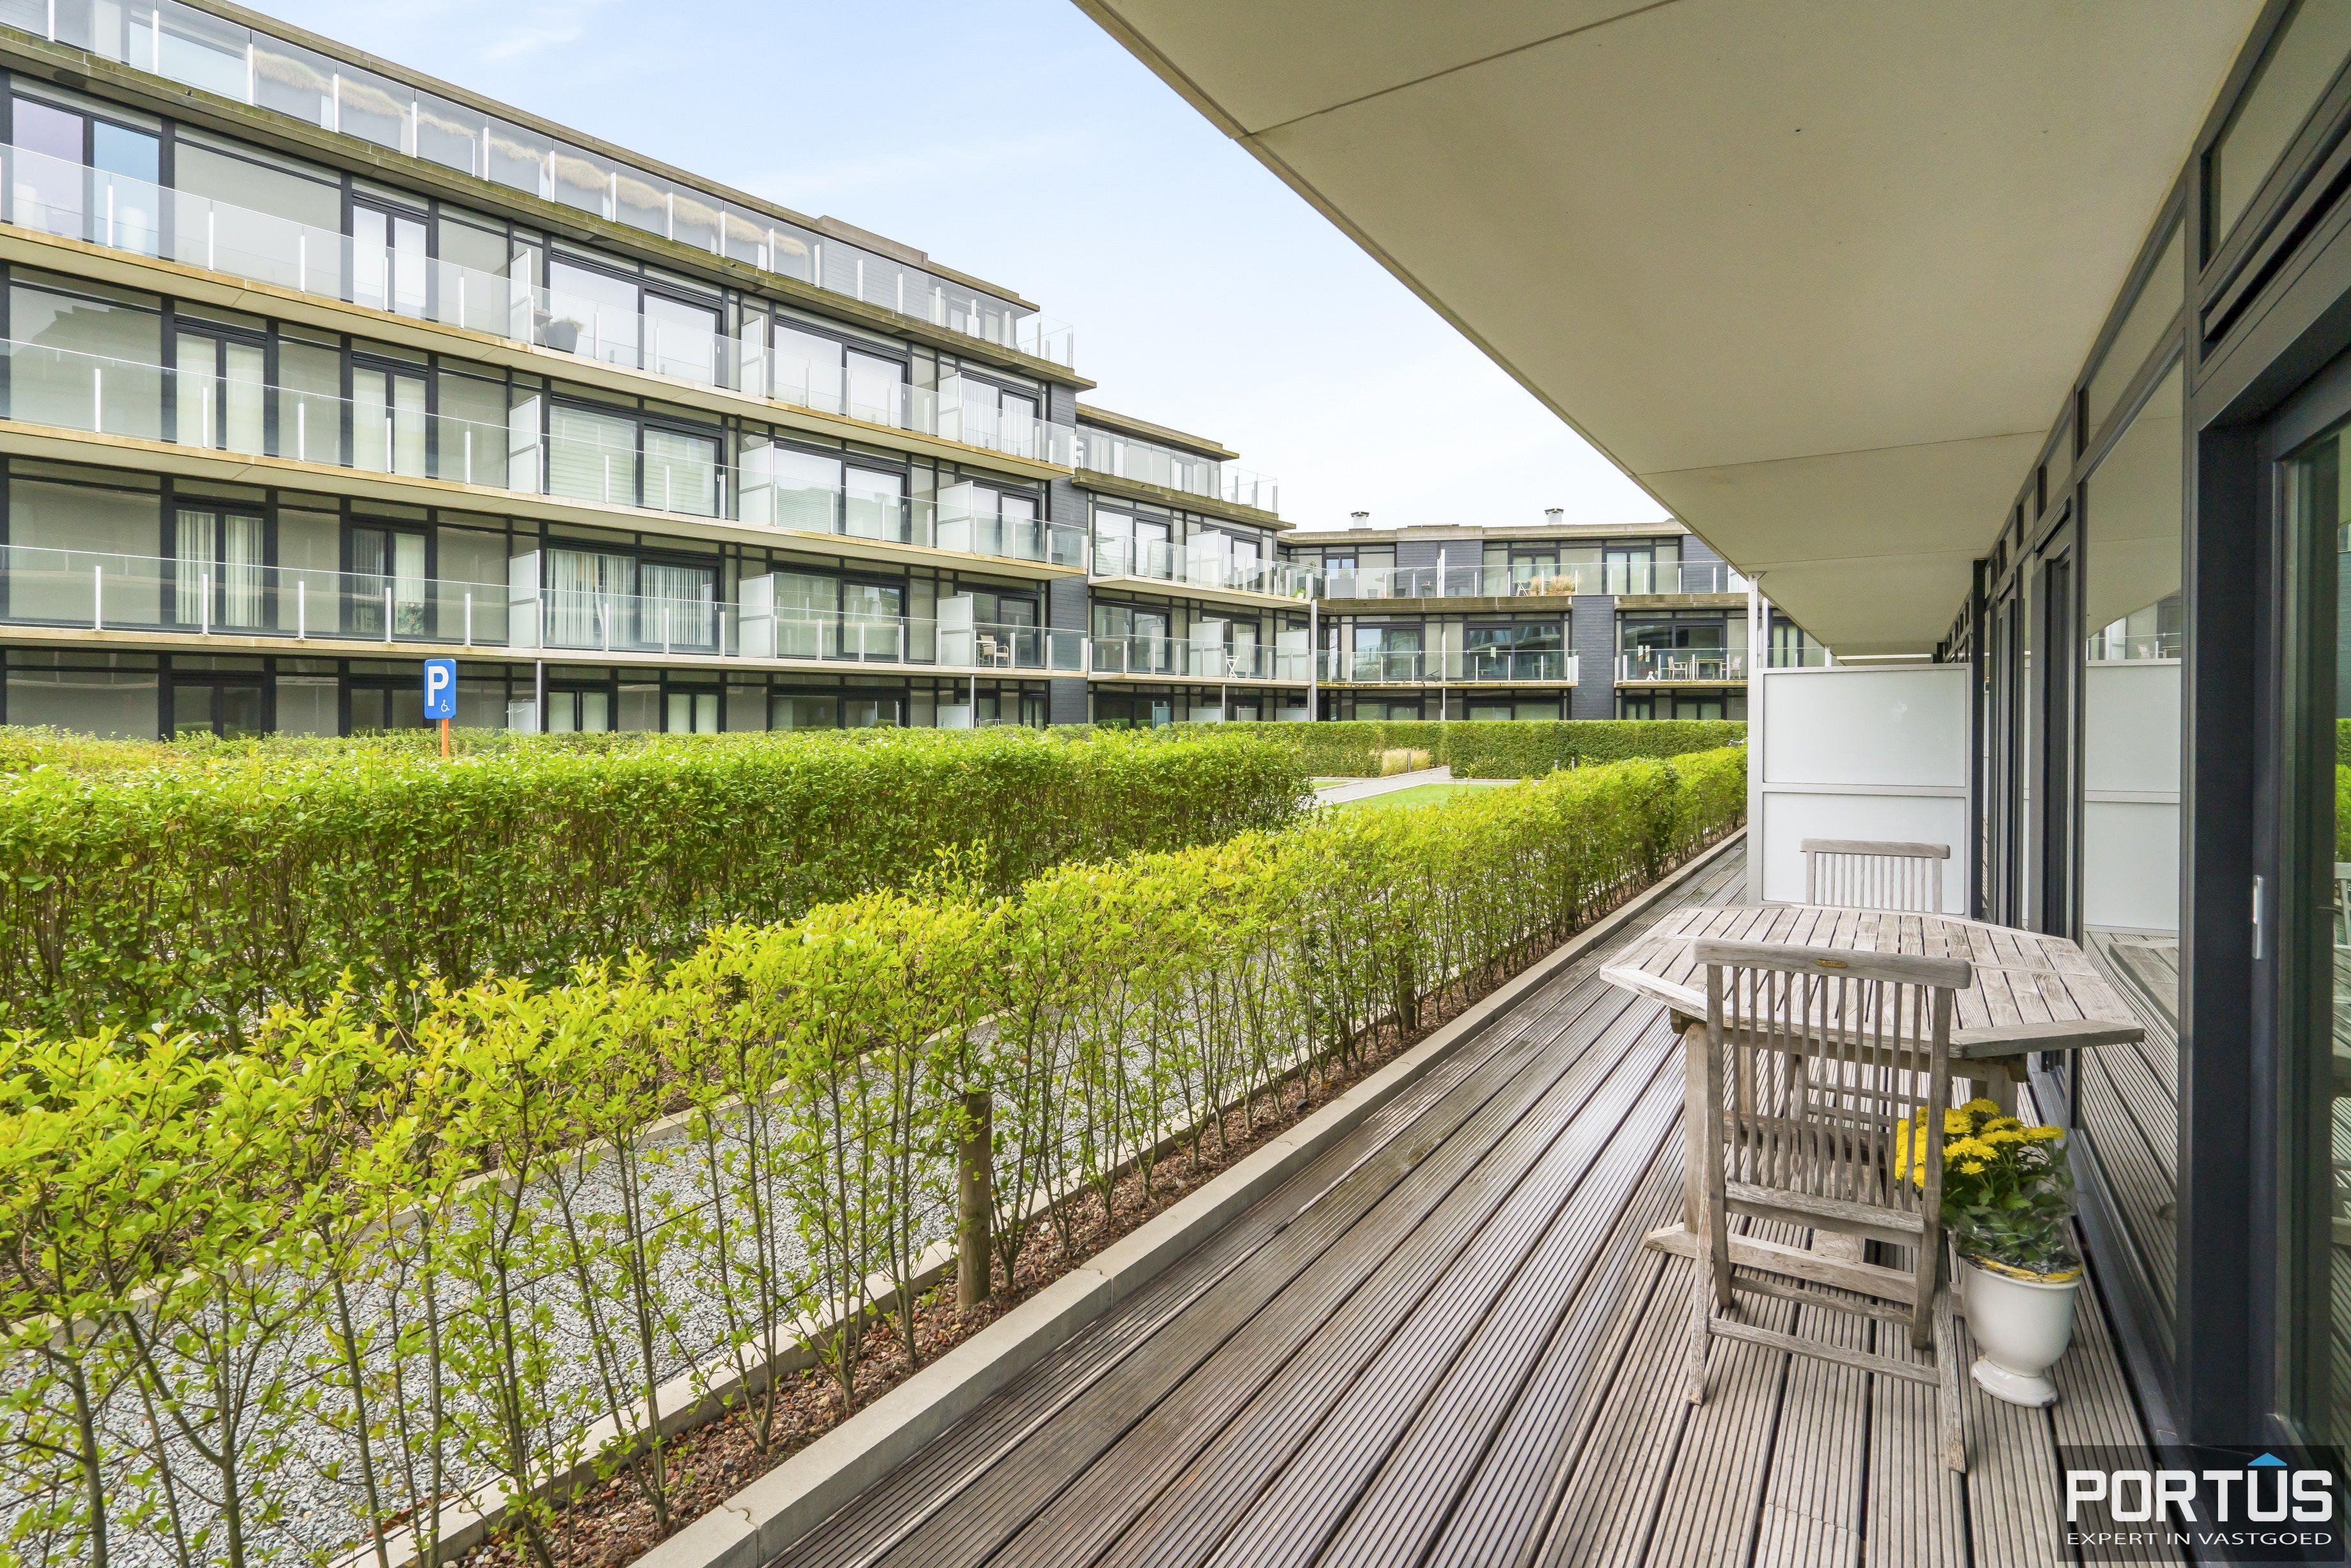 Appartement te koop met 2 slaapkamers in Residentie Waterfront te Nieuwpoort - 11871